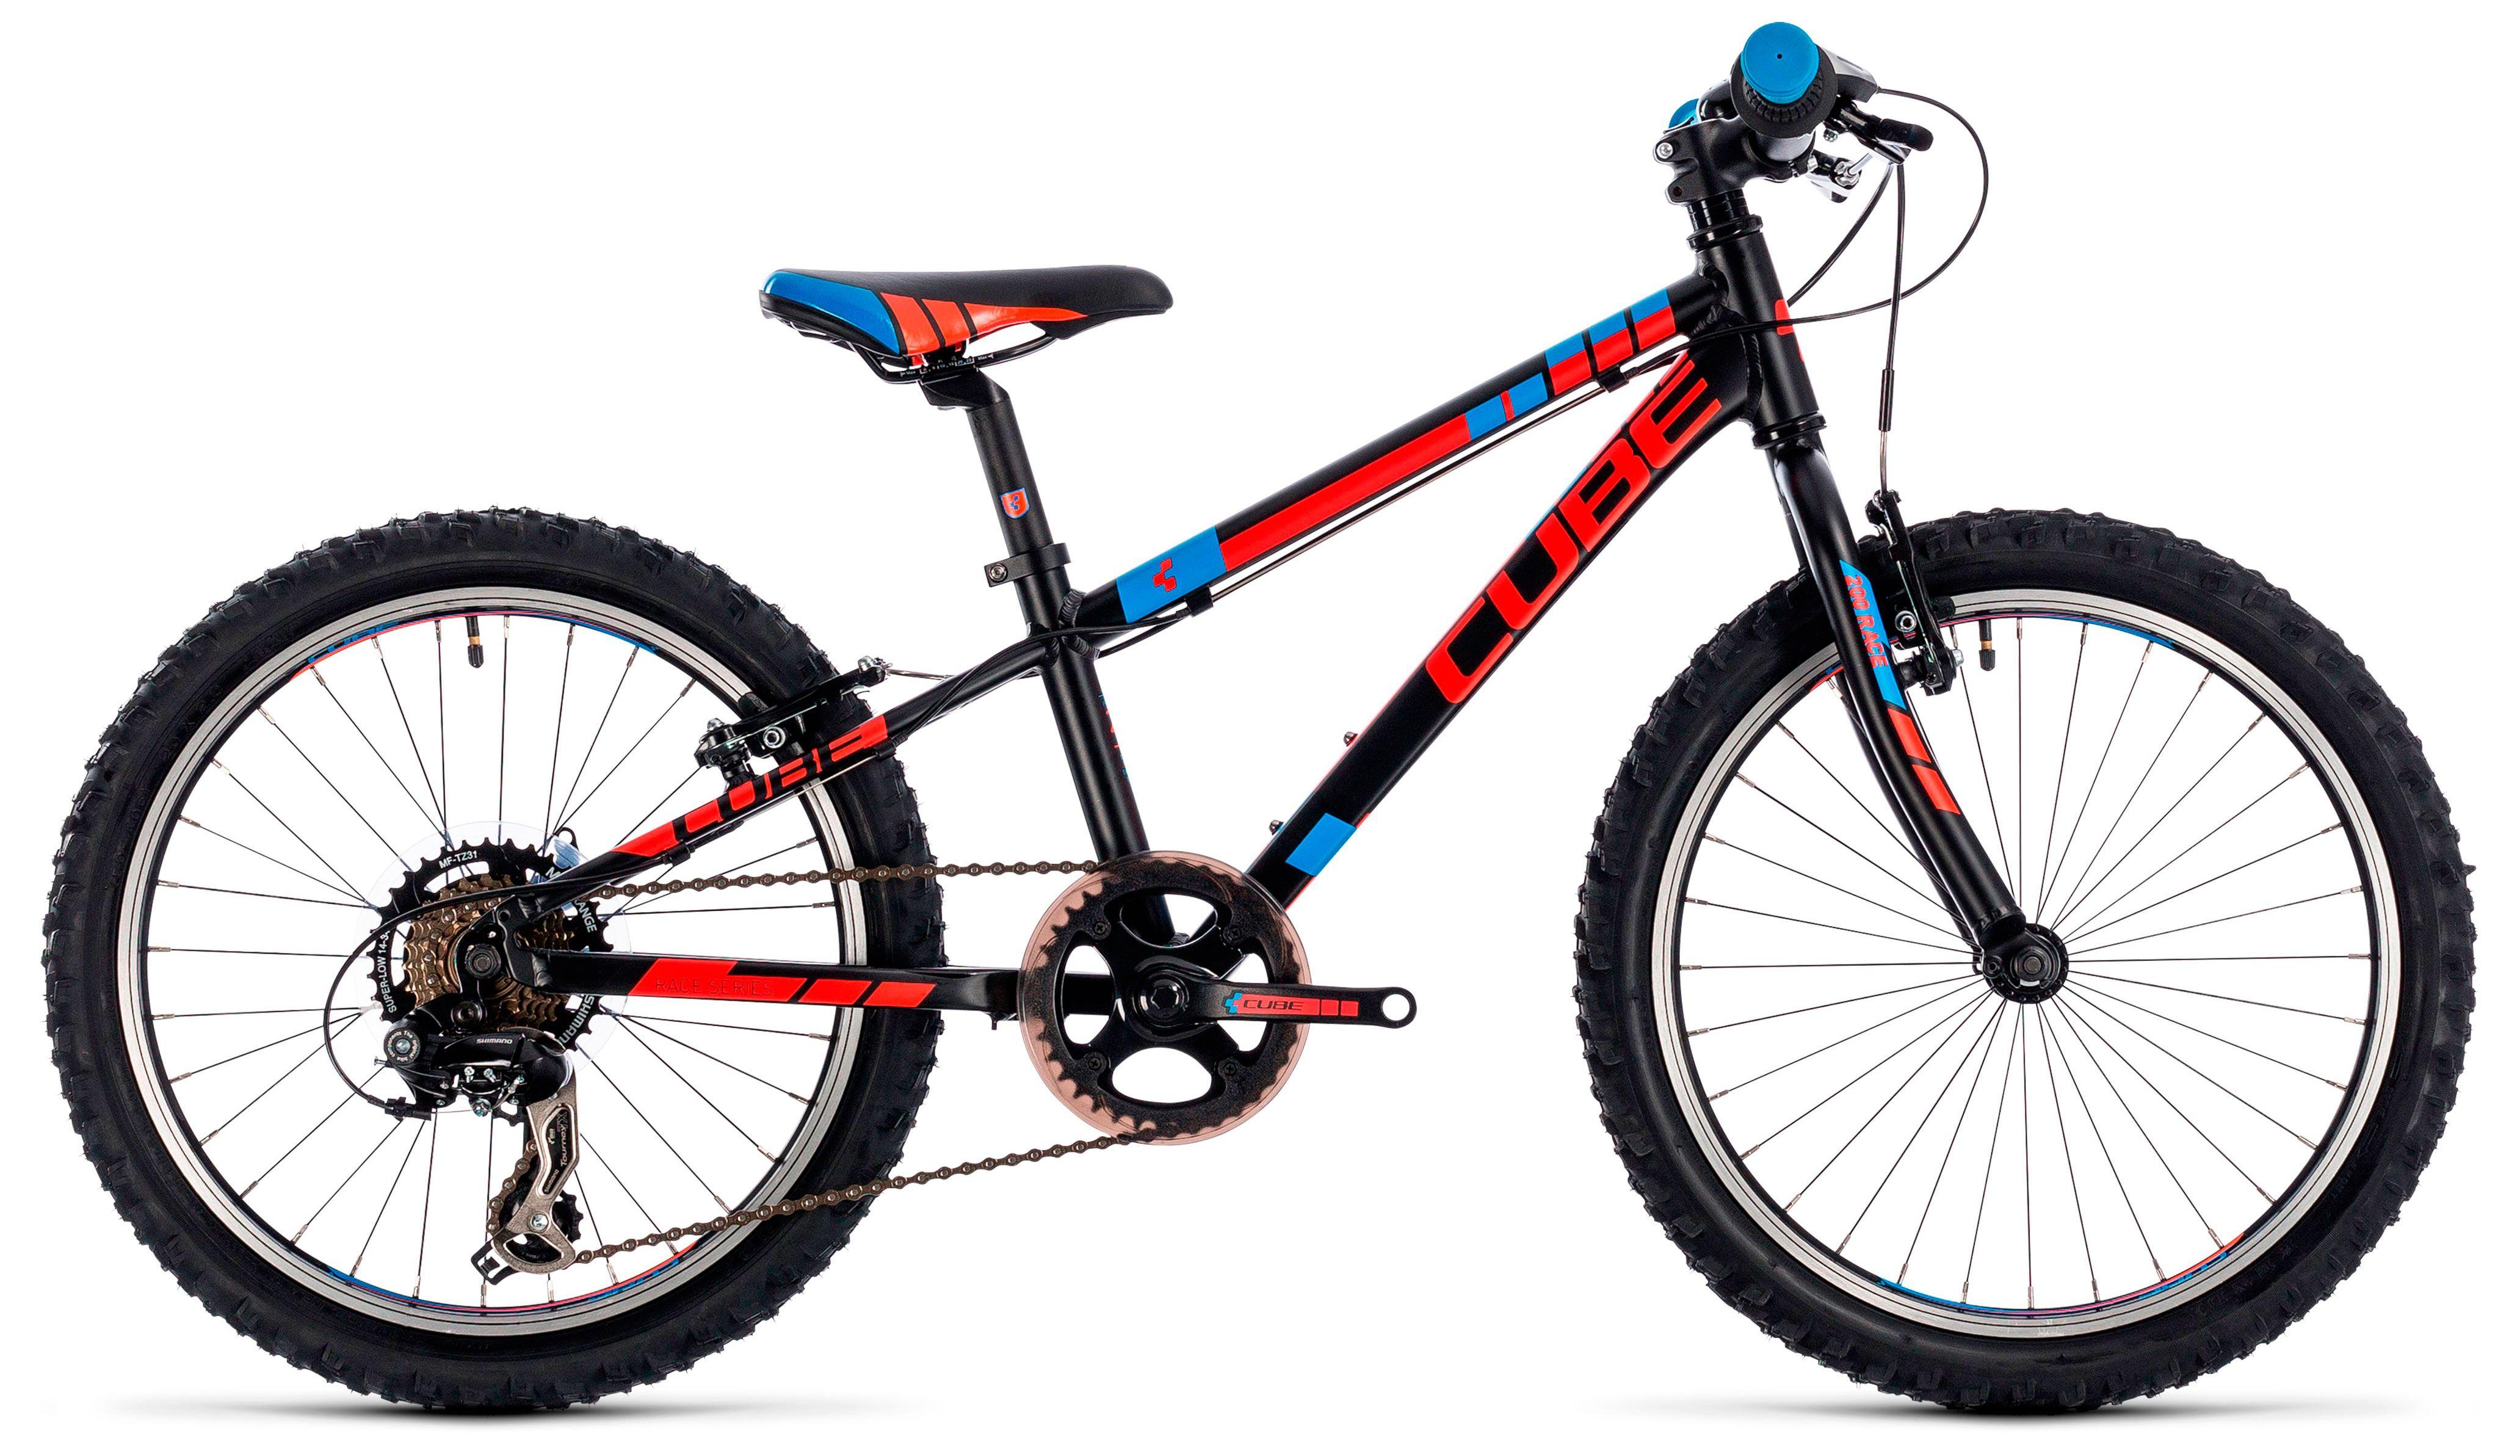 Велосипед Cube KID 200 2018 велосипед cube kid 240 die mannschaft dfb edition 2017